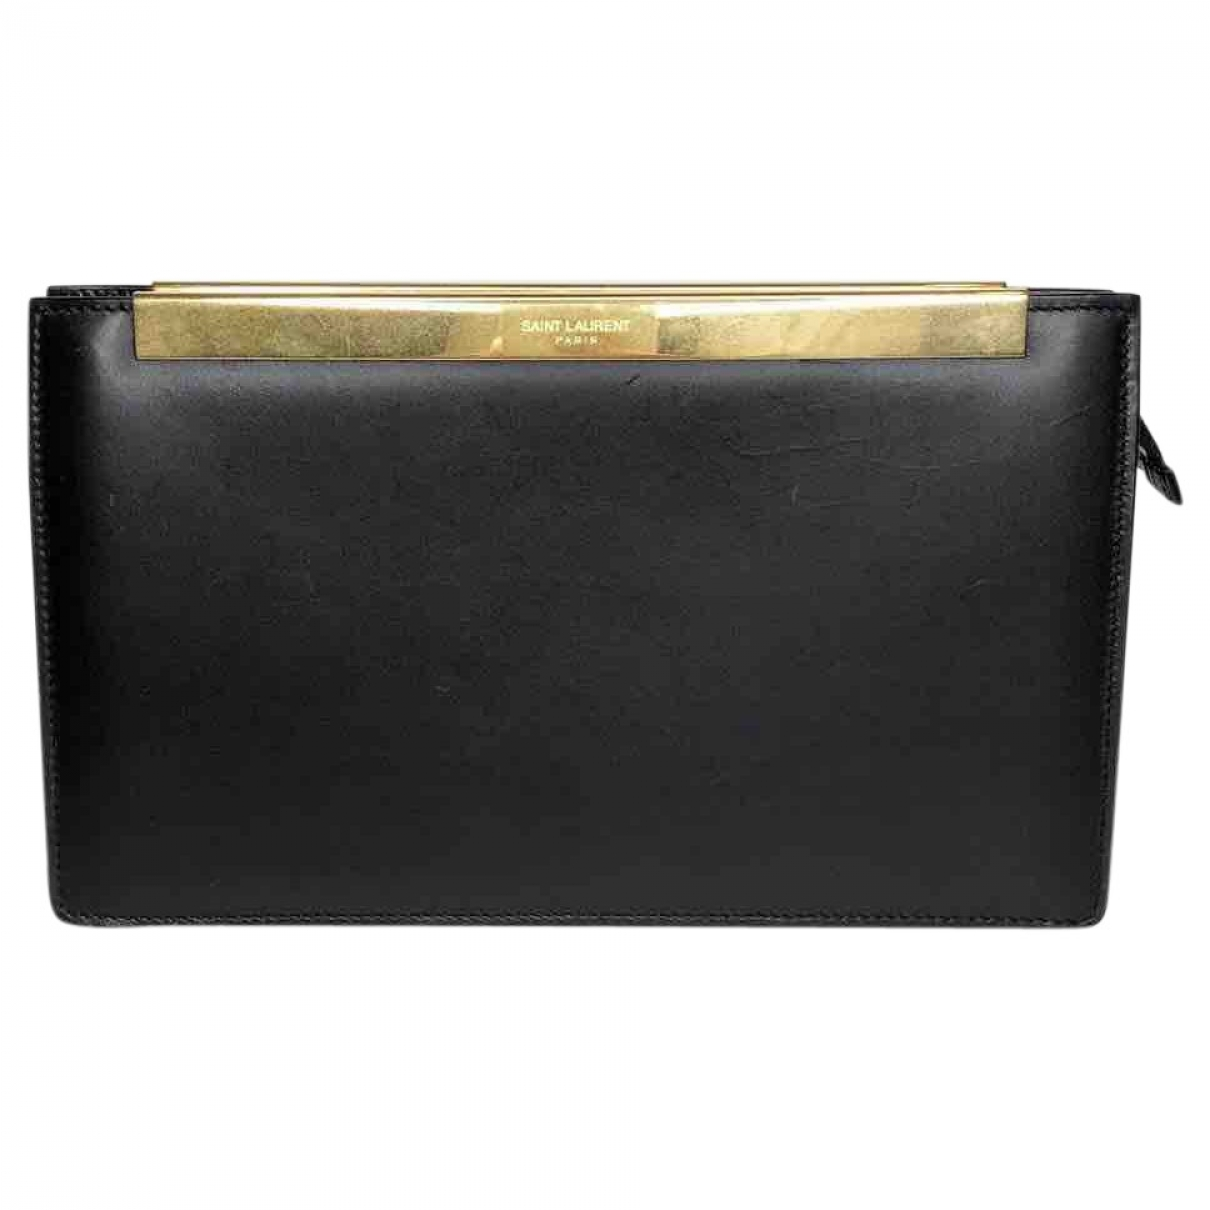 Saint Laurent \N Black Leather Clutch bag for Women \N